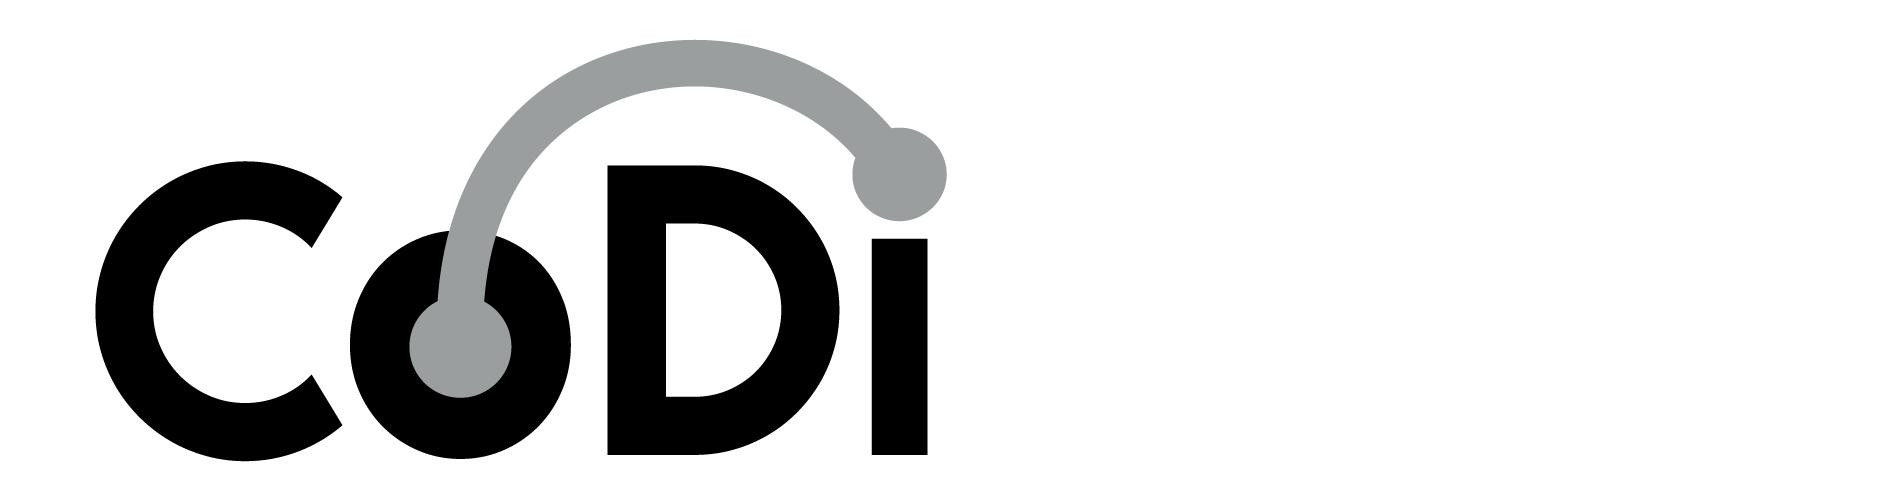 logo-codi-960x502